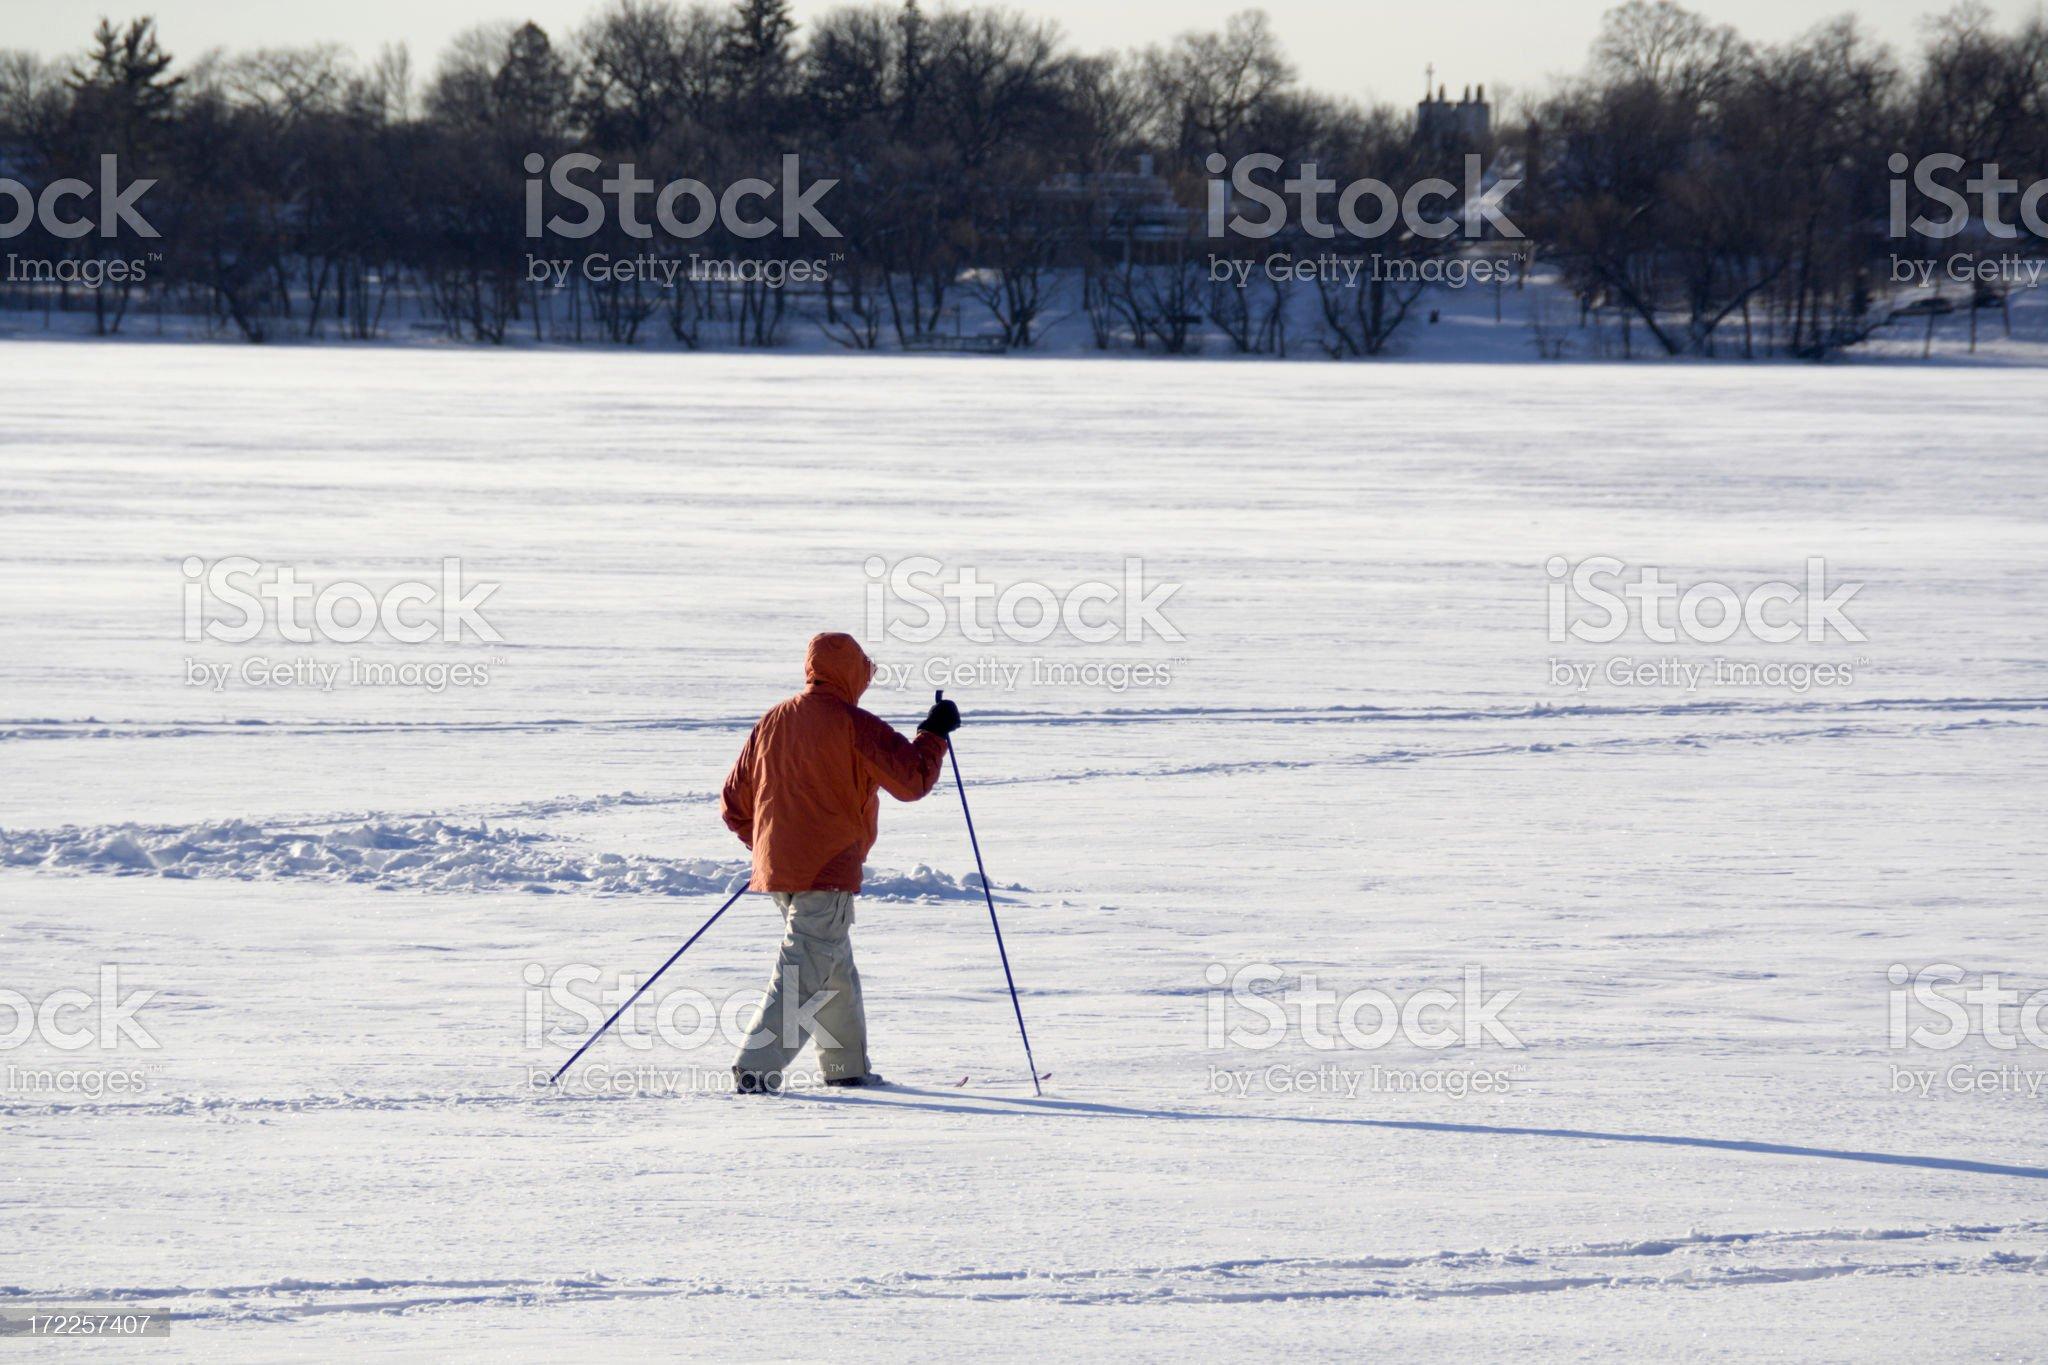 Skiing Across the Lake royalty-free stock photo